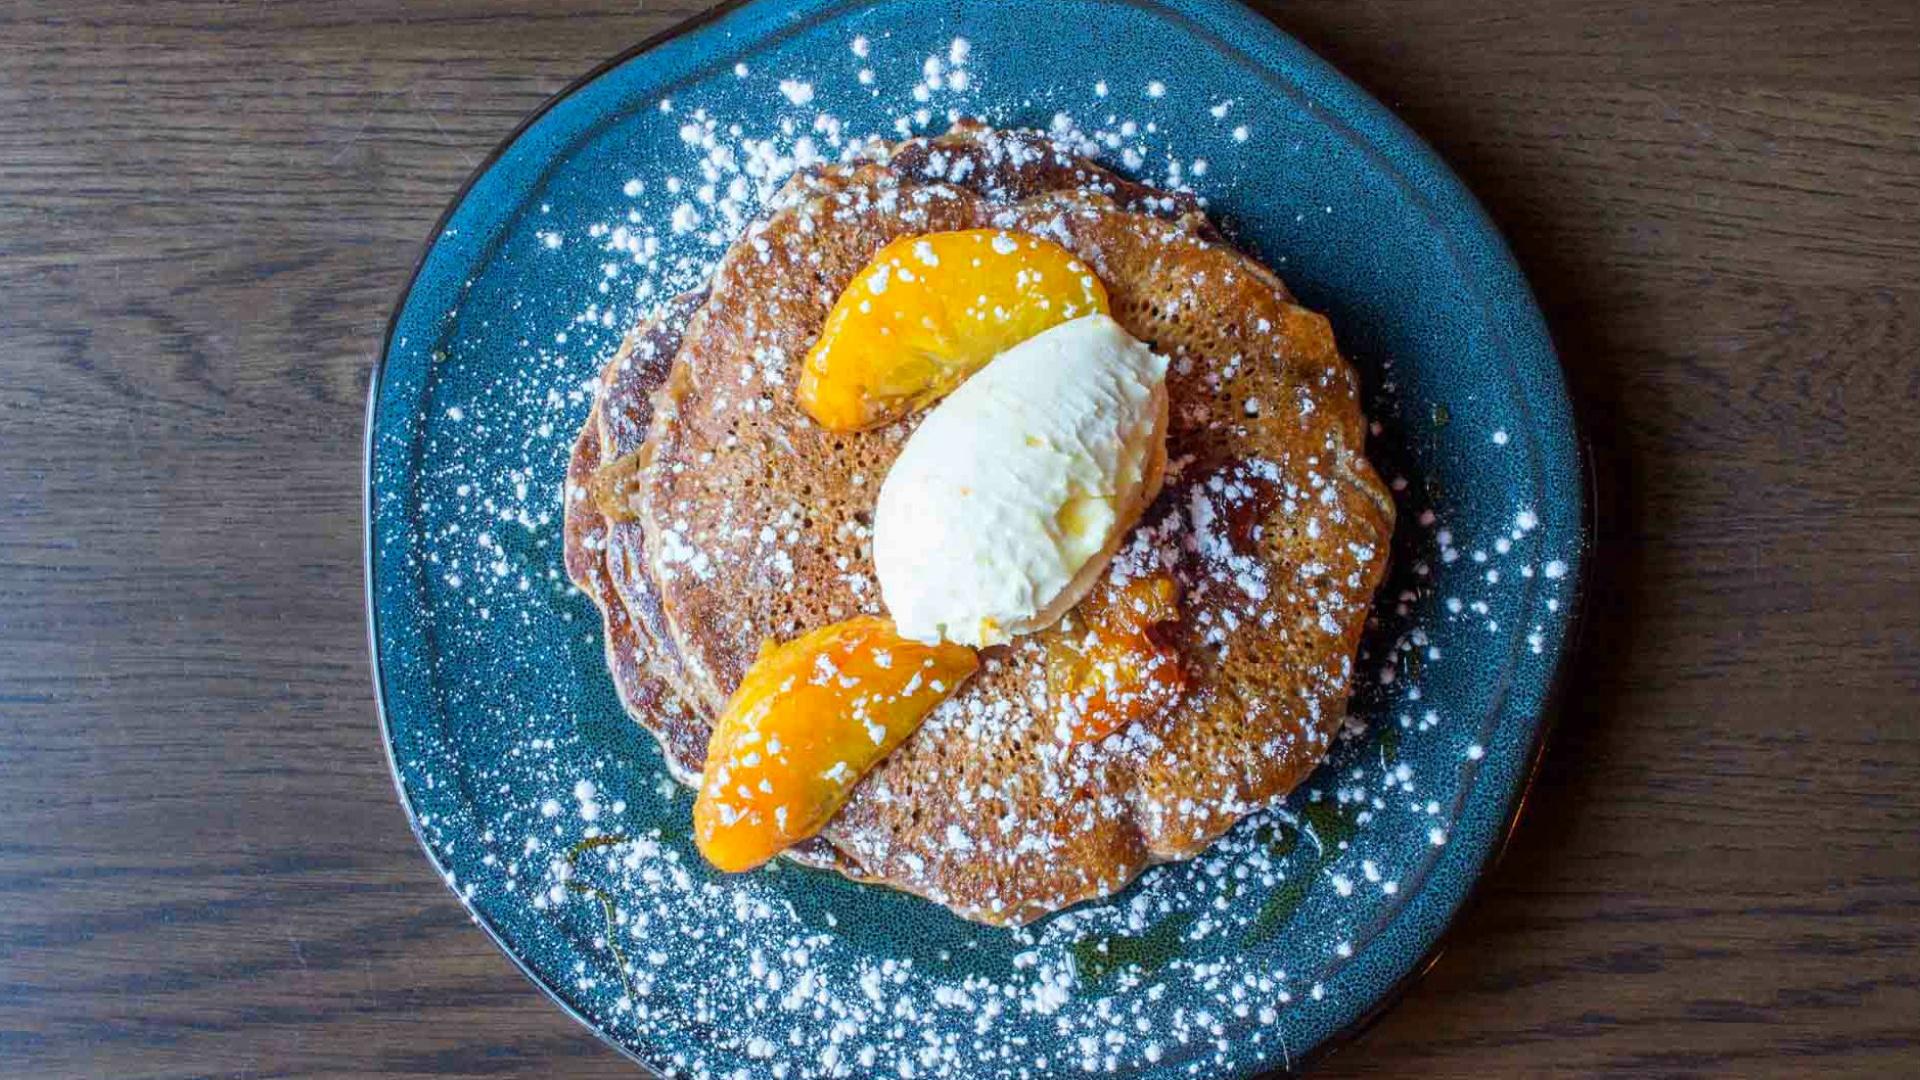 Liberty Commons's Chocolate Milk & Stout Pancakes